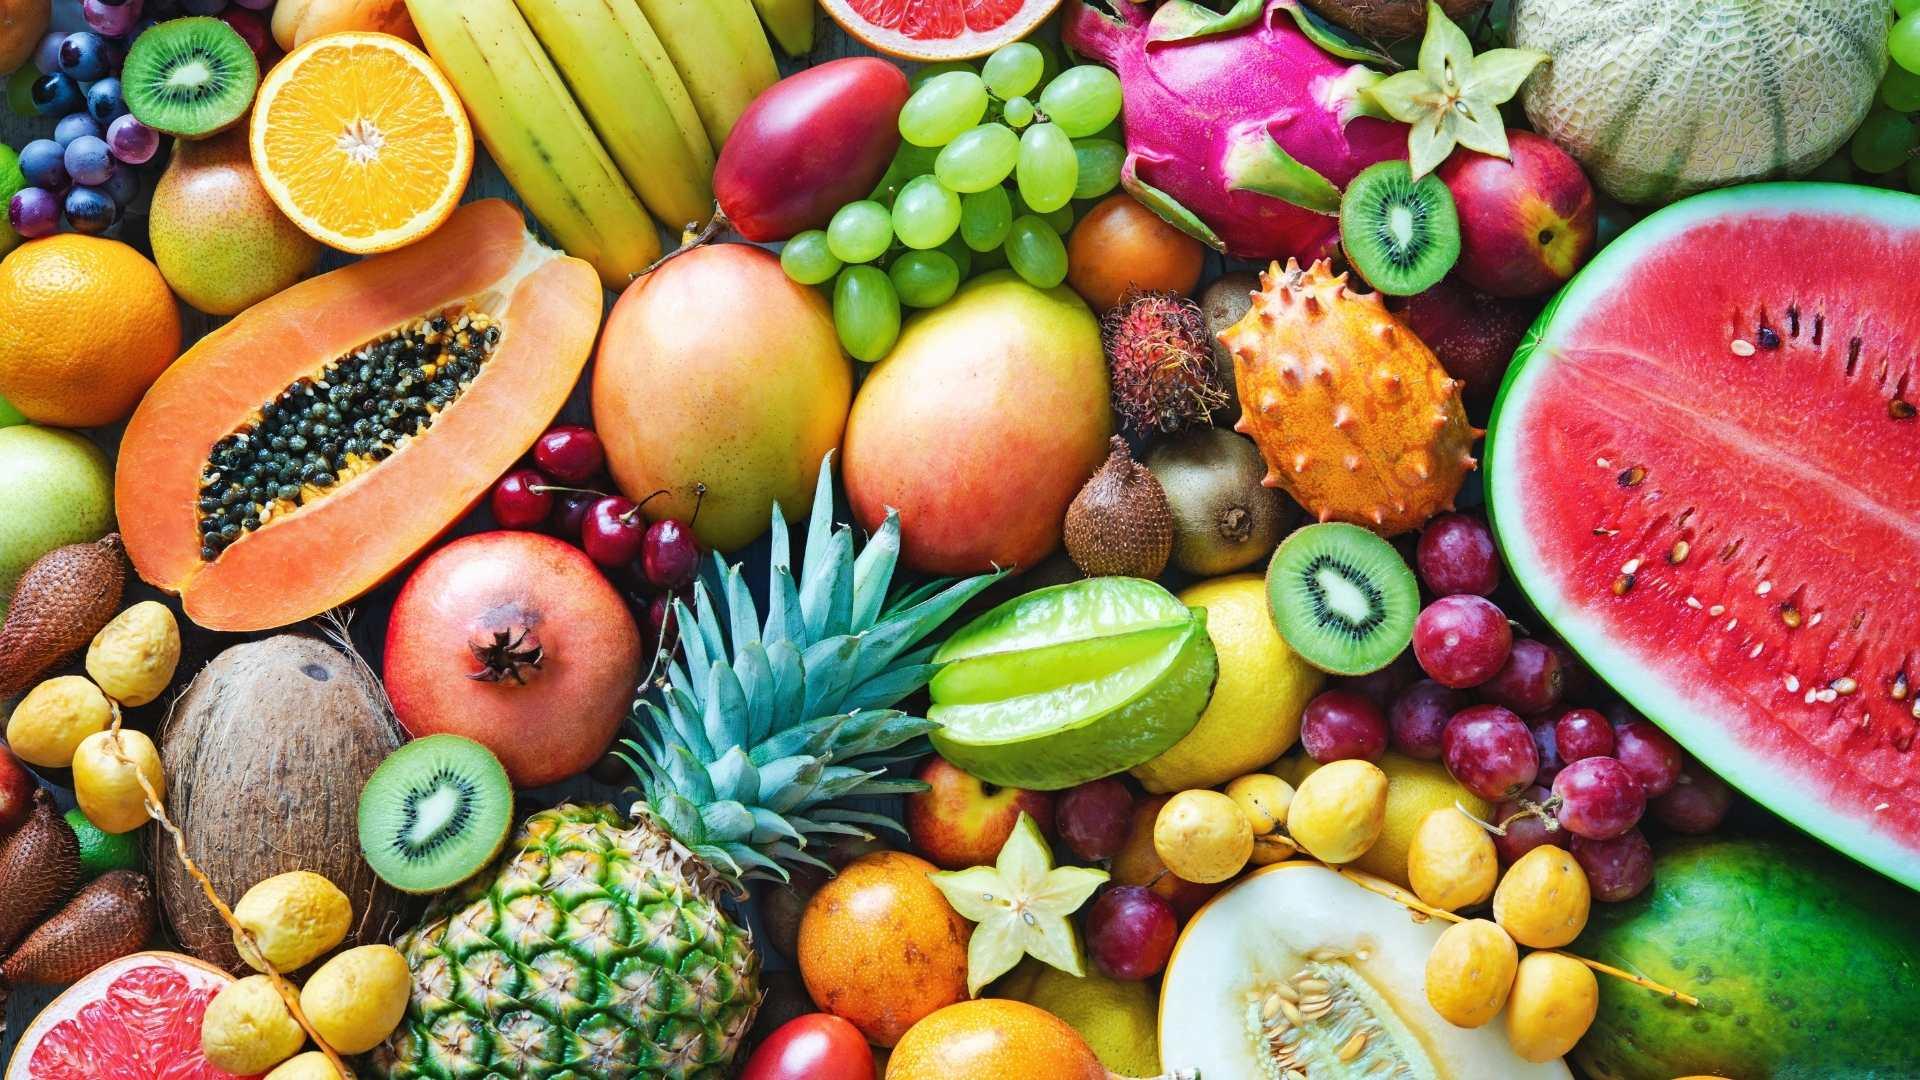 Fruit Attraction LIVEConnect: transformación de un evento ferial profesional